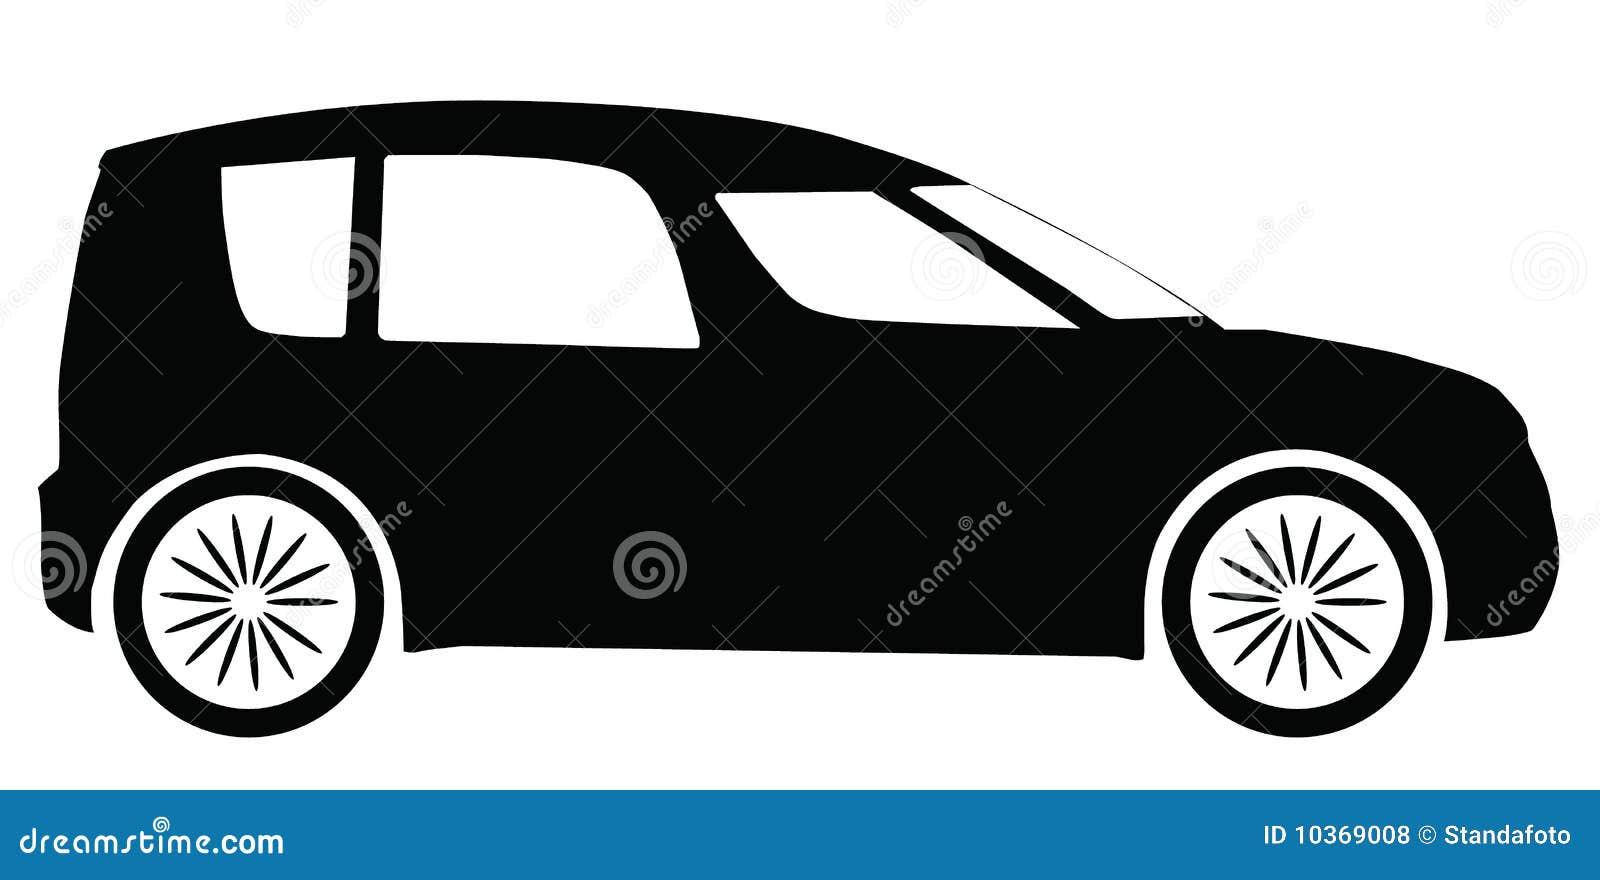 Vector Skoda Roomster Car Silhouette Royalty Free Stock Photos ...